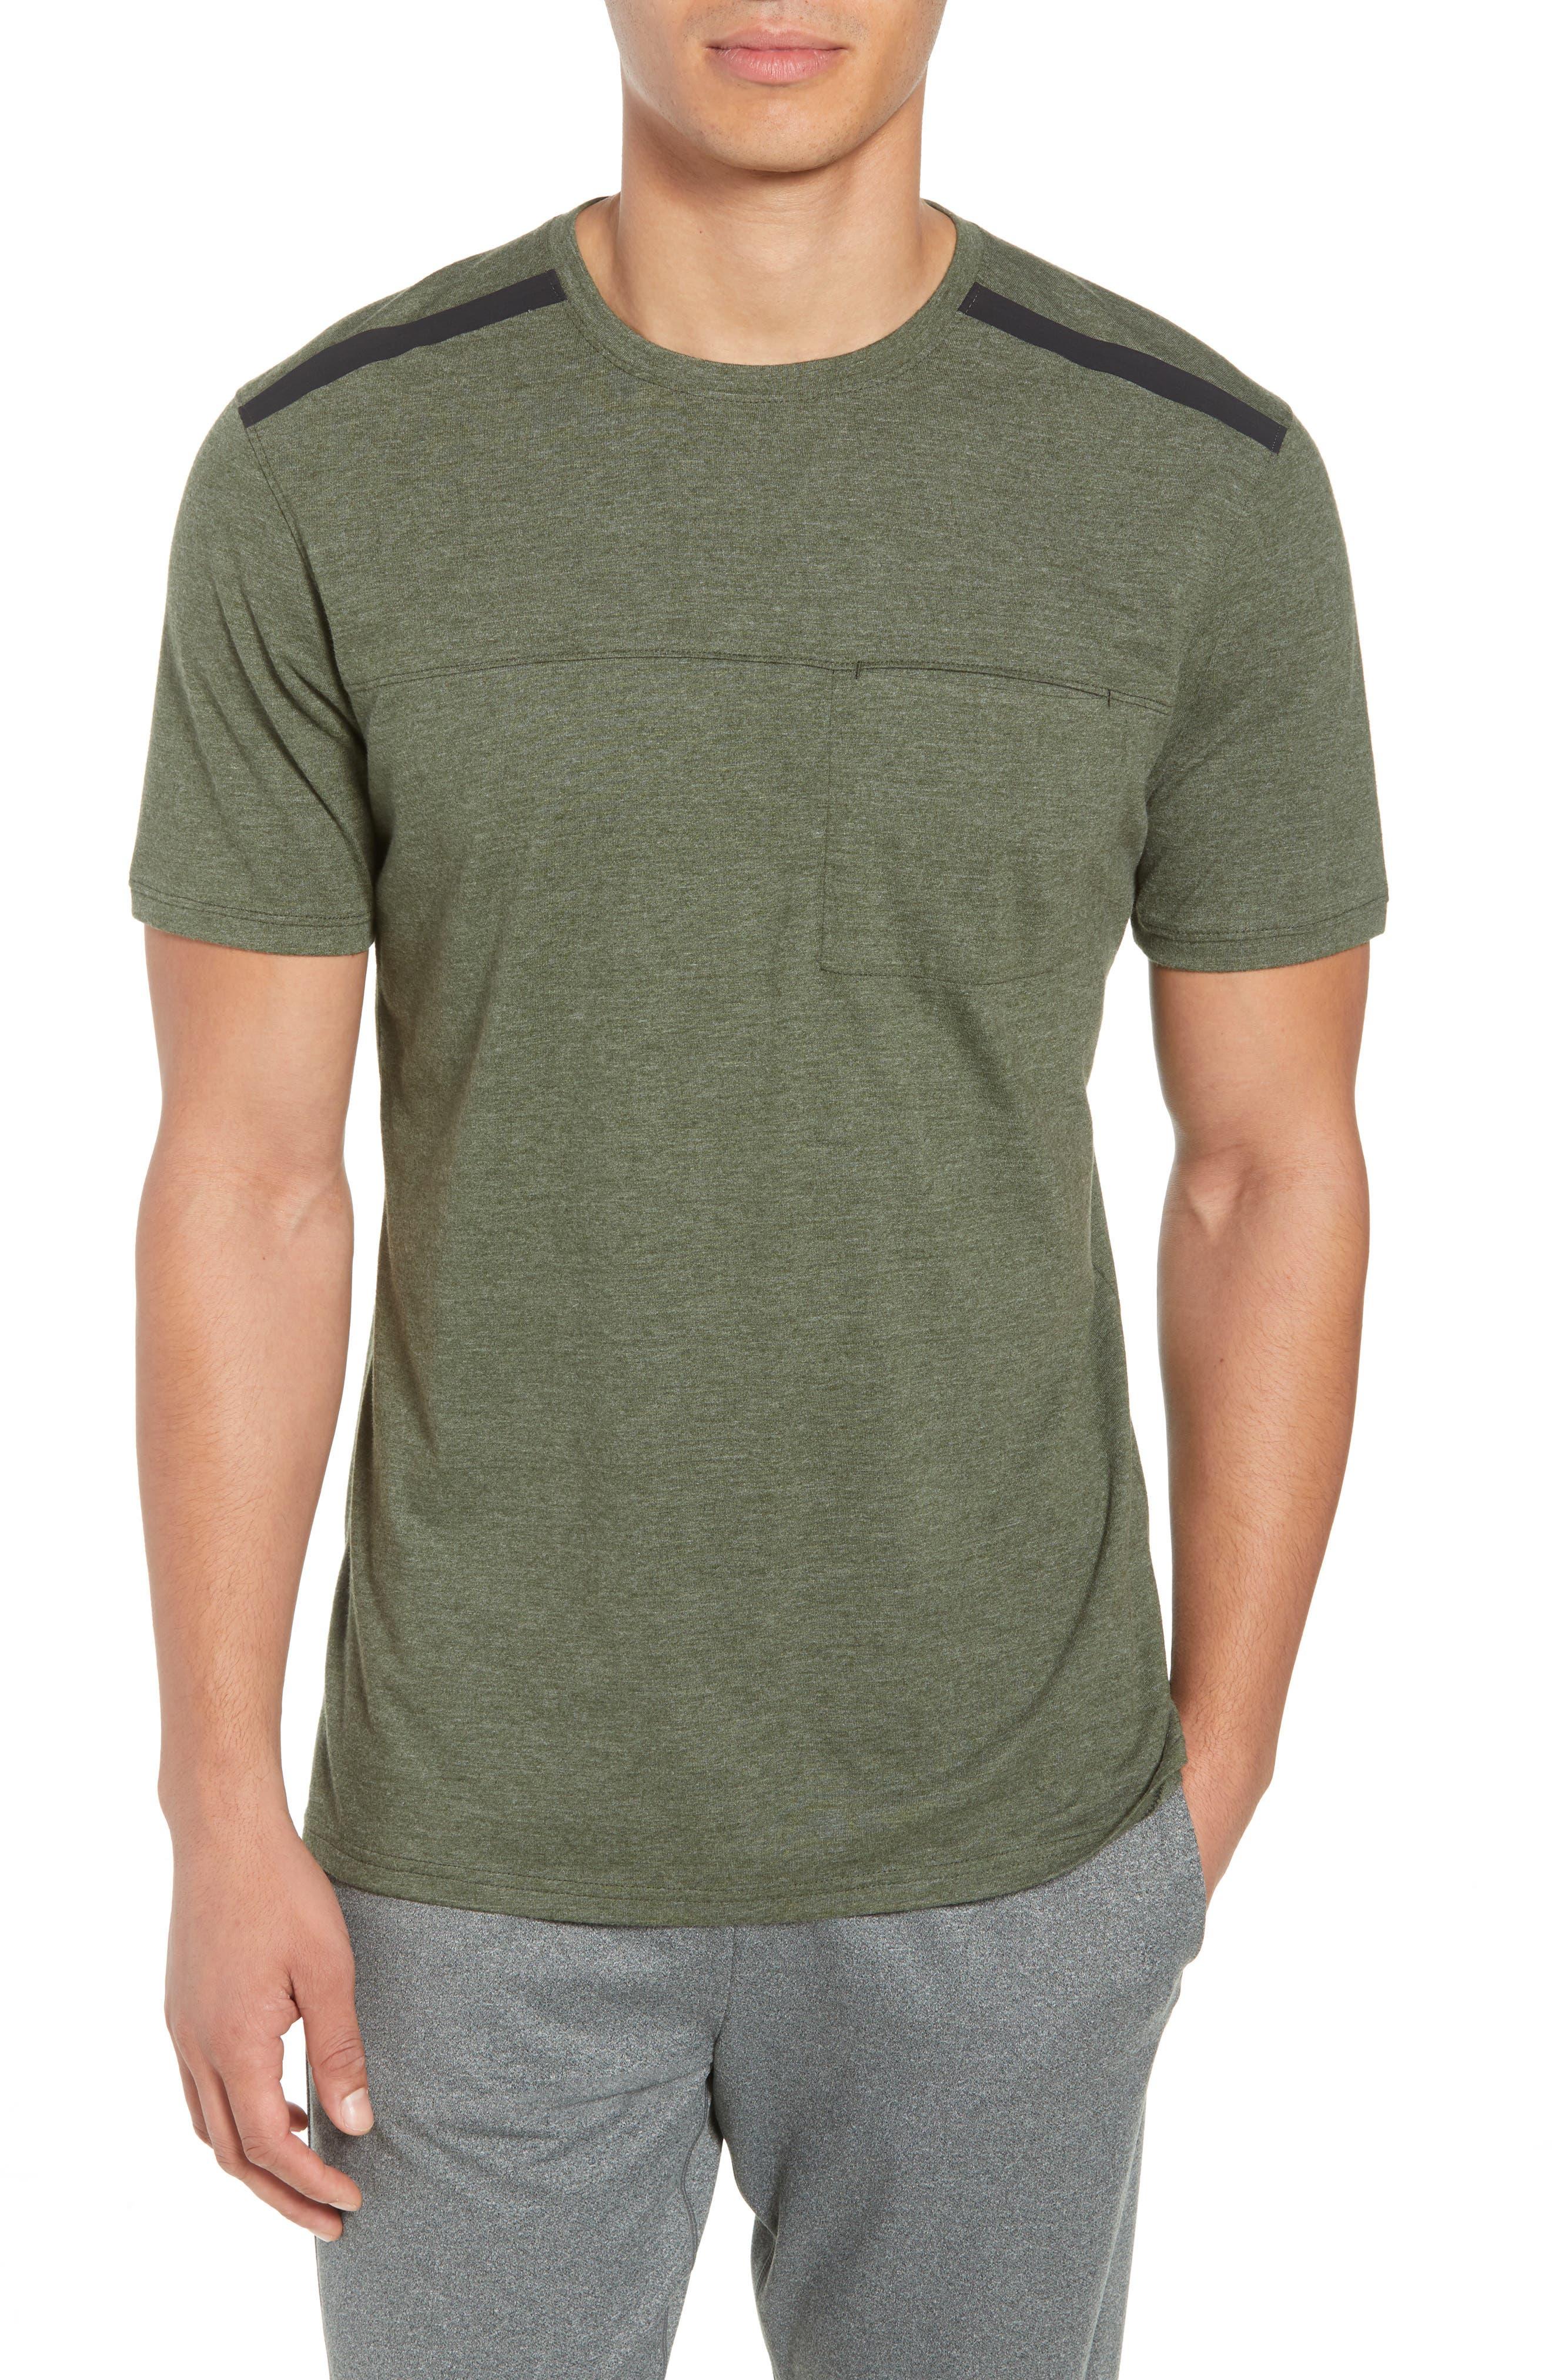 Perfomance T-Shirt,                         Main,                         color, GREEN TACTICAL MELANGE